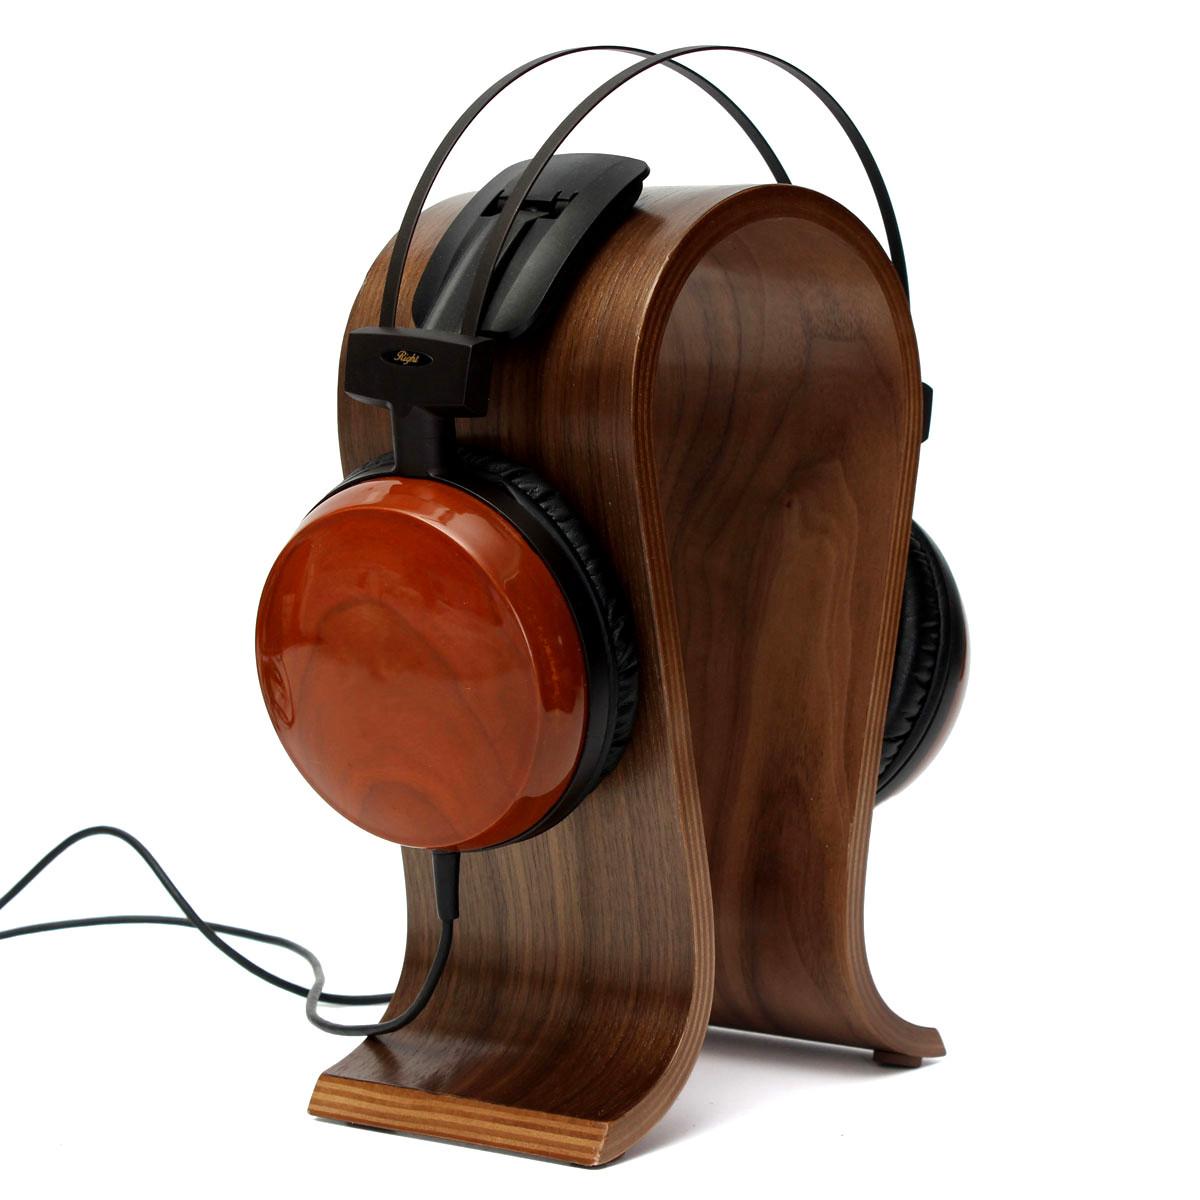 Solid wooden headphone stand hanger holder display rack brown lazada ph - Wooden headphone holder ...